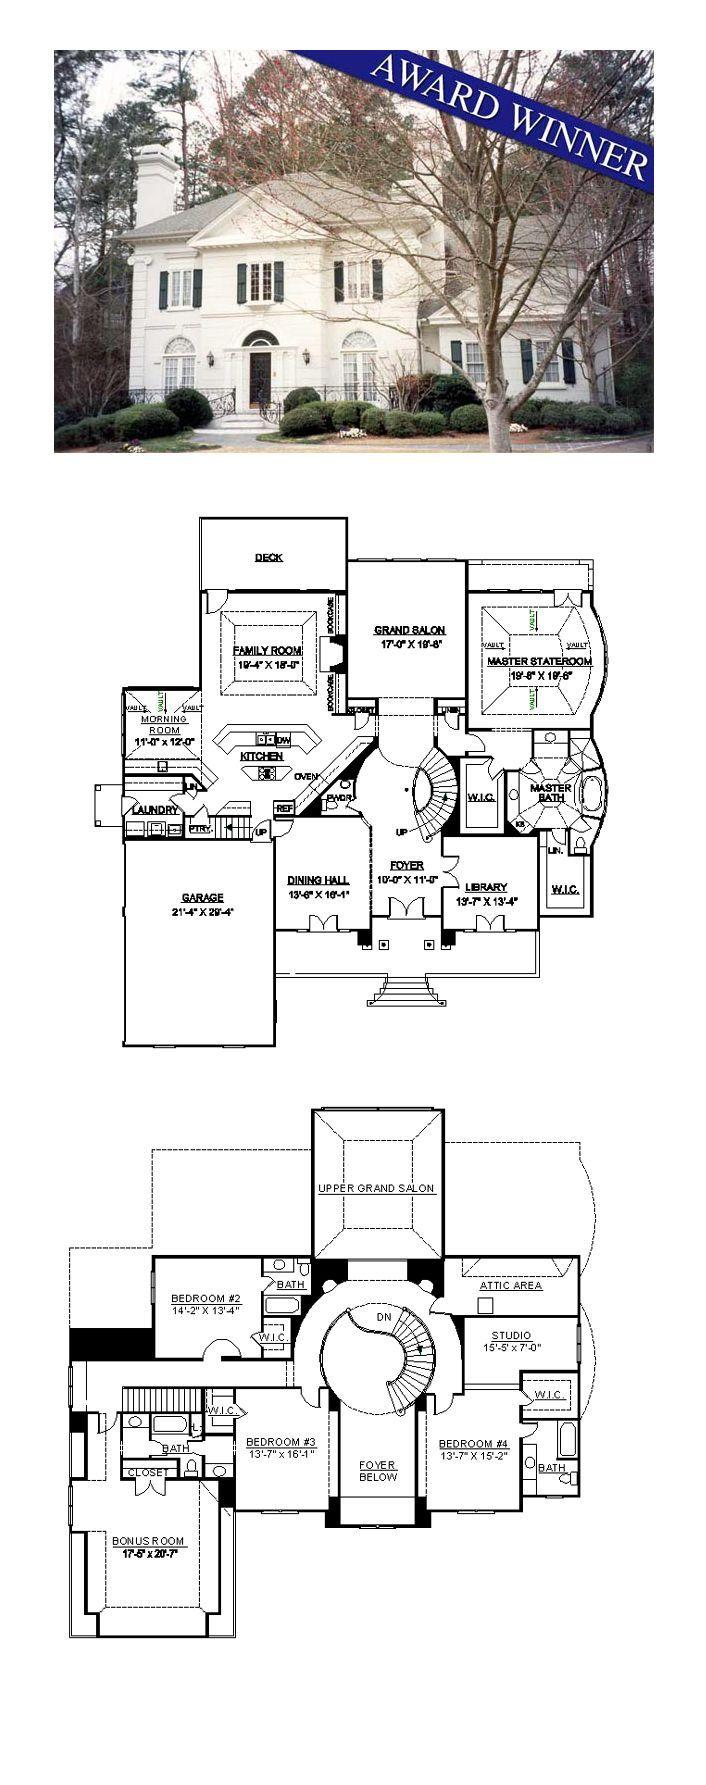 Best 25 suburban house ideas on pinterest for Suburban house blueprints